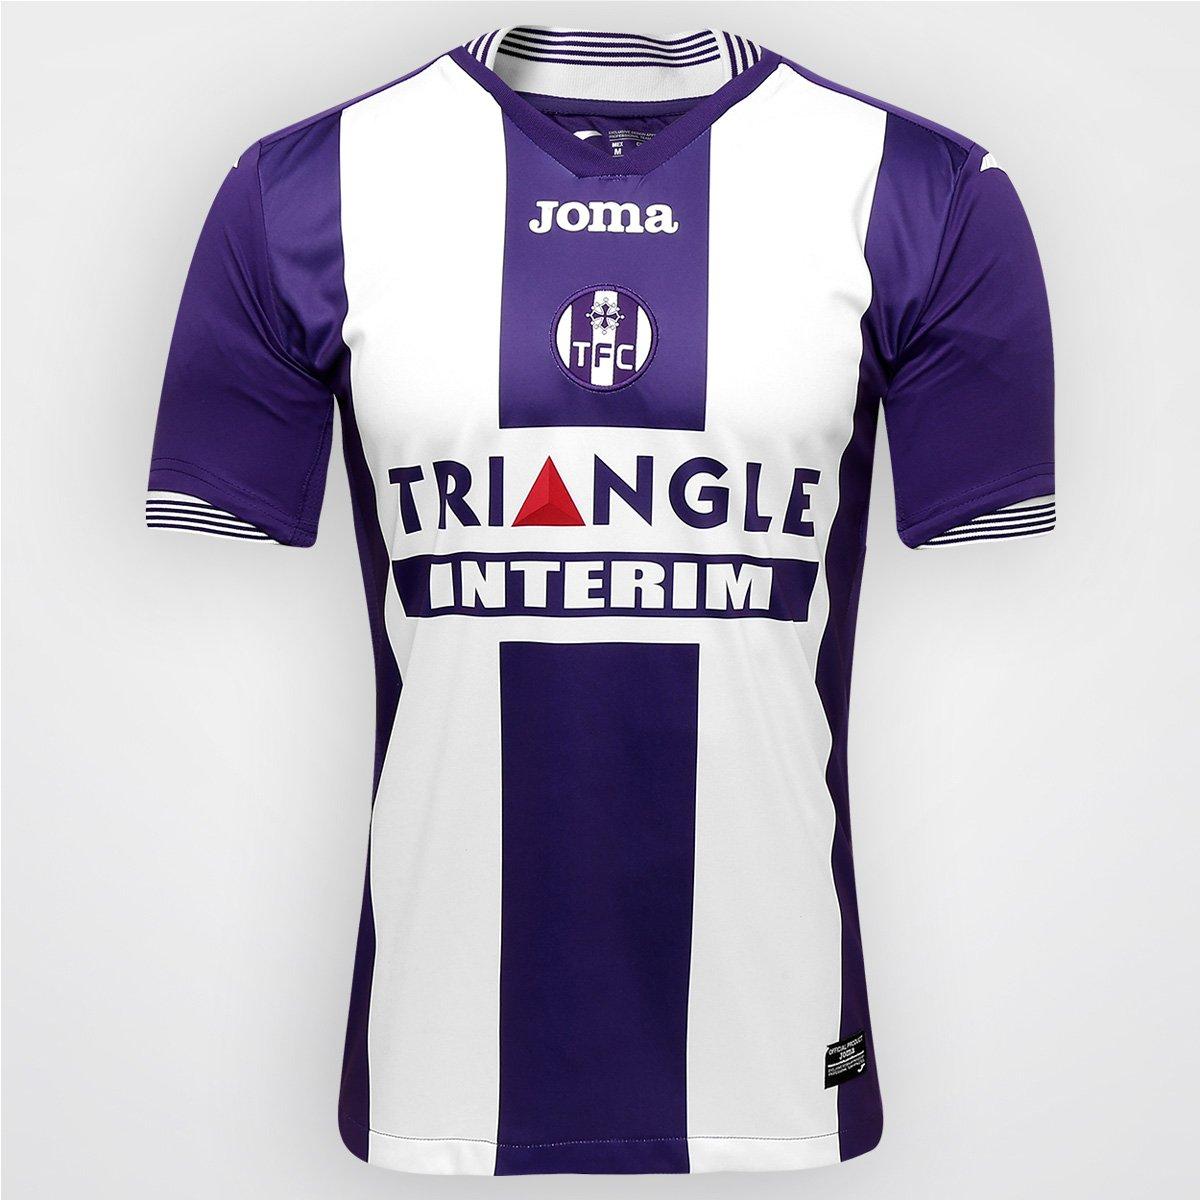 4bdd064fc8 Camisa Toulouse Home 15 16 s nº - Torcedor Joma Masculina - Compre Agora